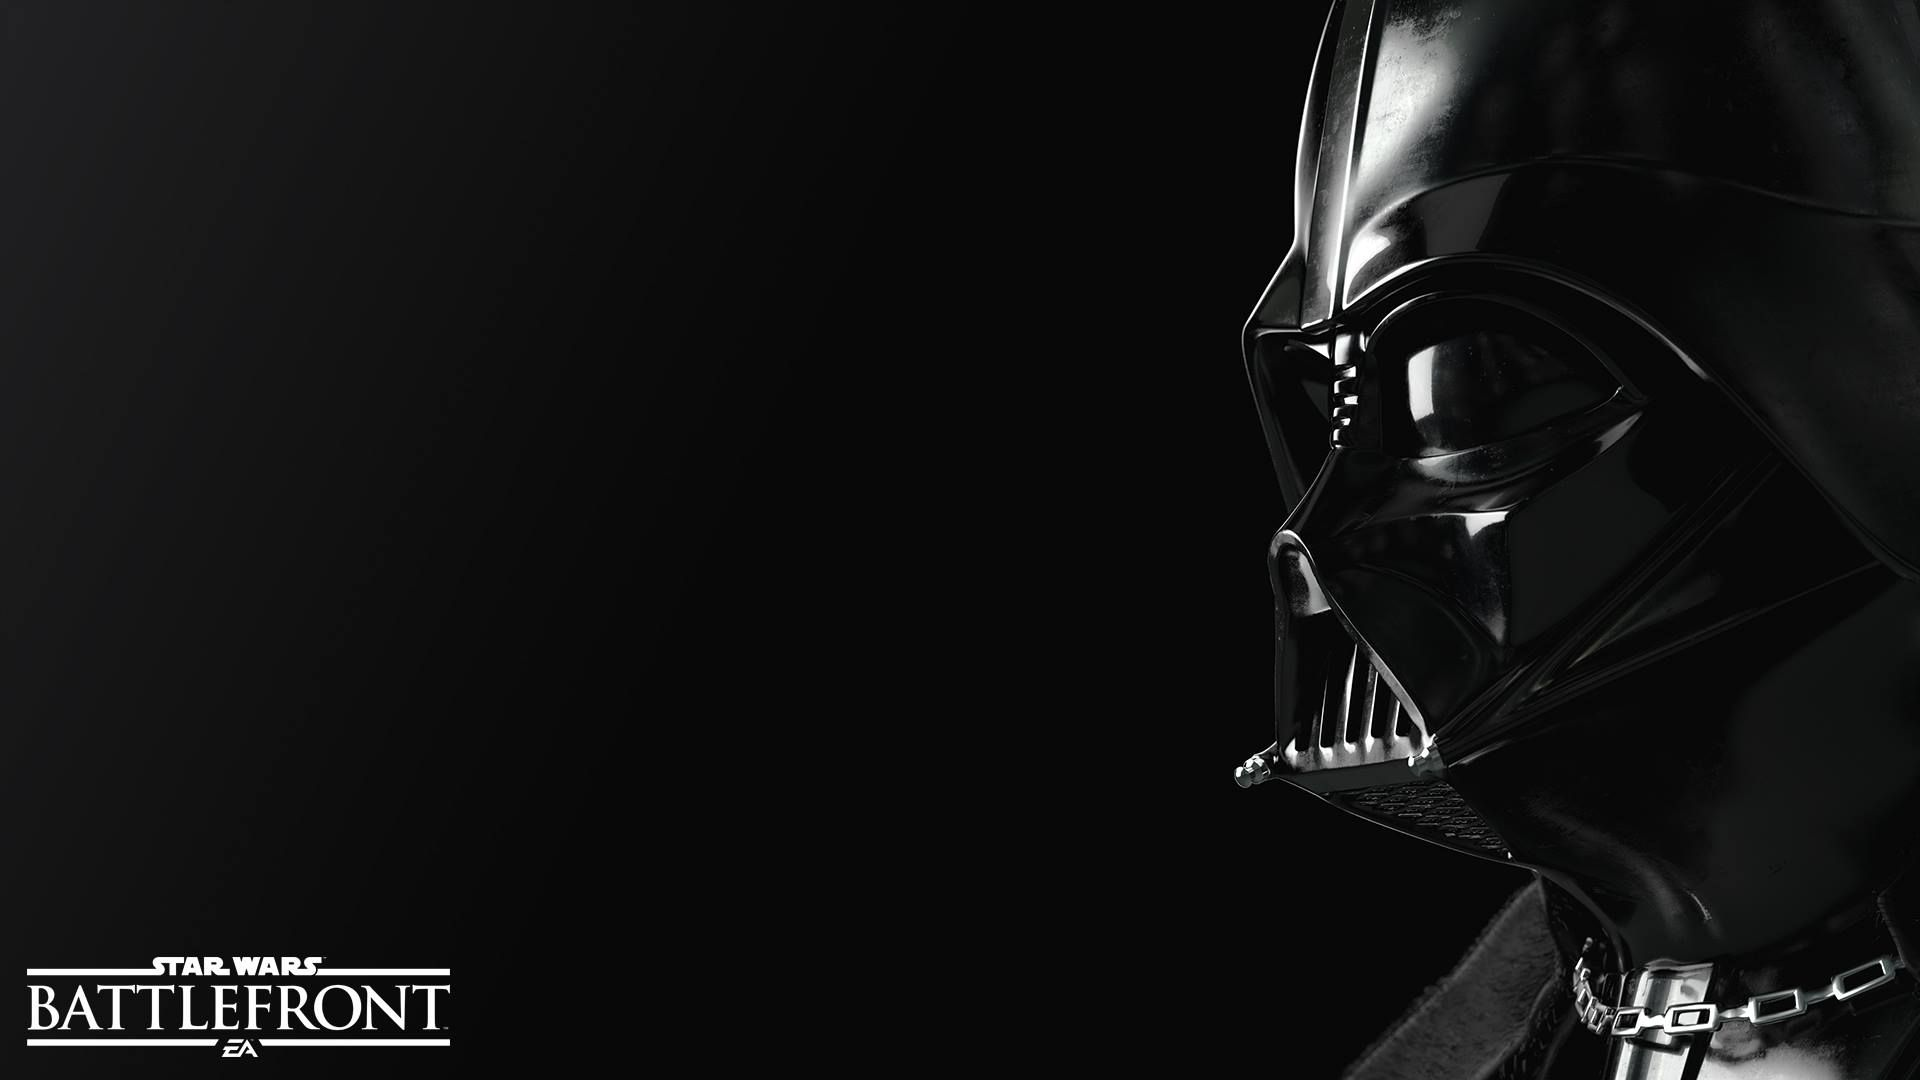 Darth Vader Star Wars Battlefront Game Hd Wallpaper Id 7364 Download Page Star Wars Wallpaper Darth Vader Wallpaper Star Wars Battlefront